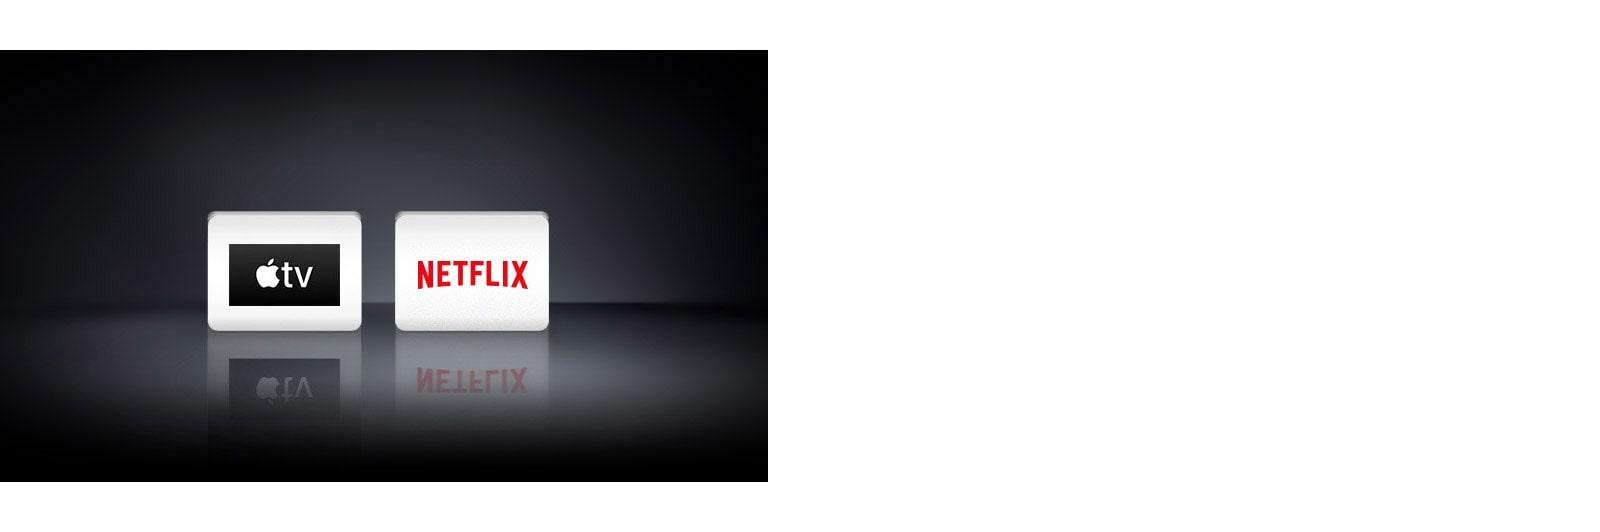 Два логотипа: Приложението Apple TV и Netflix